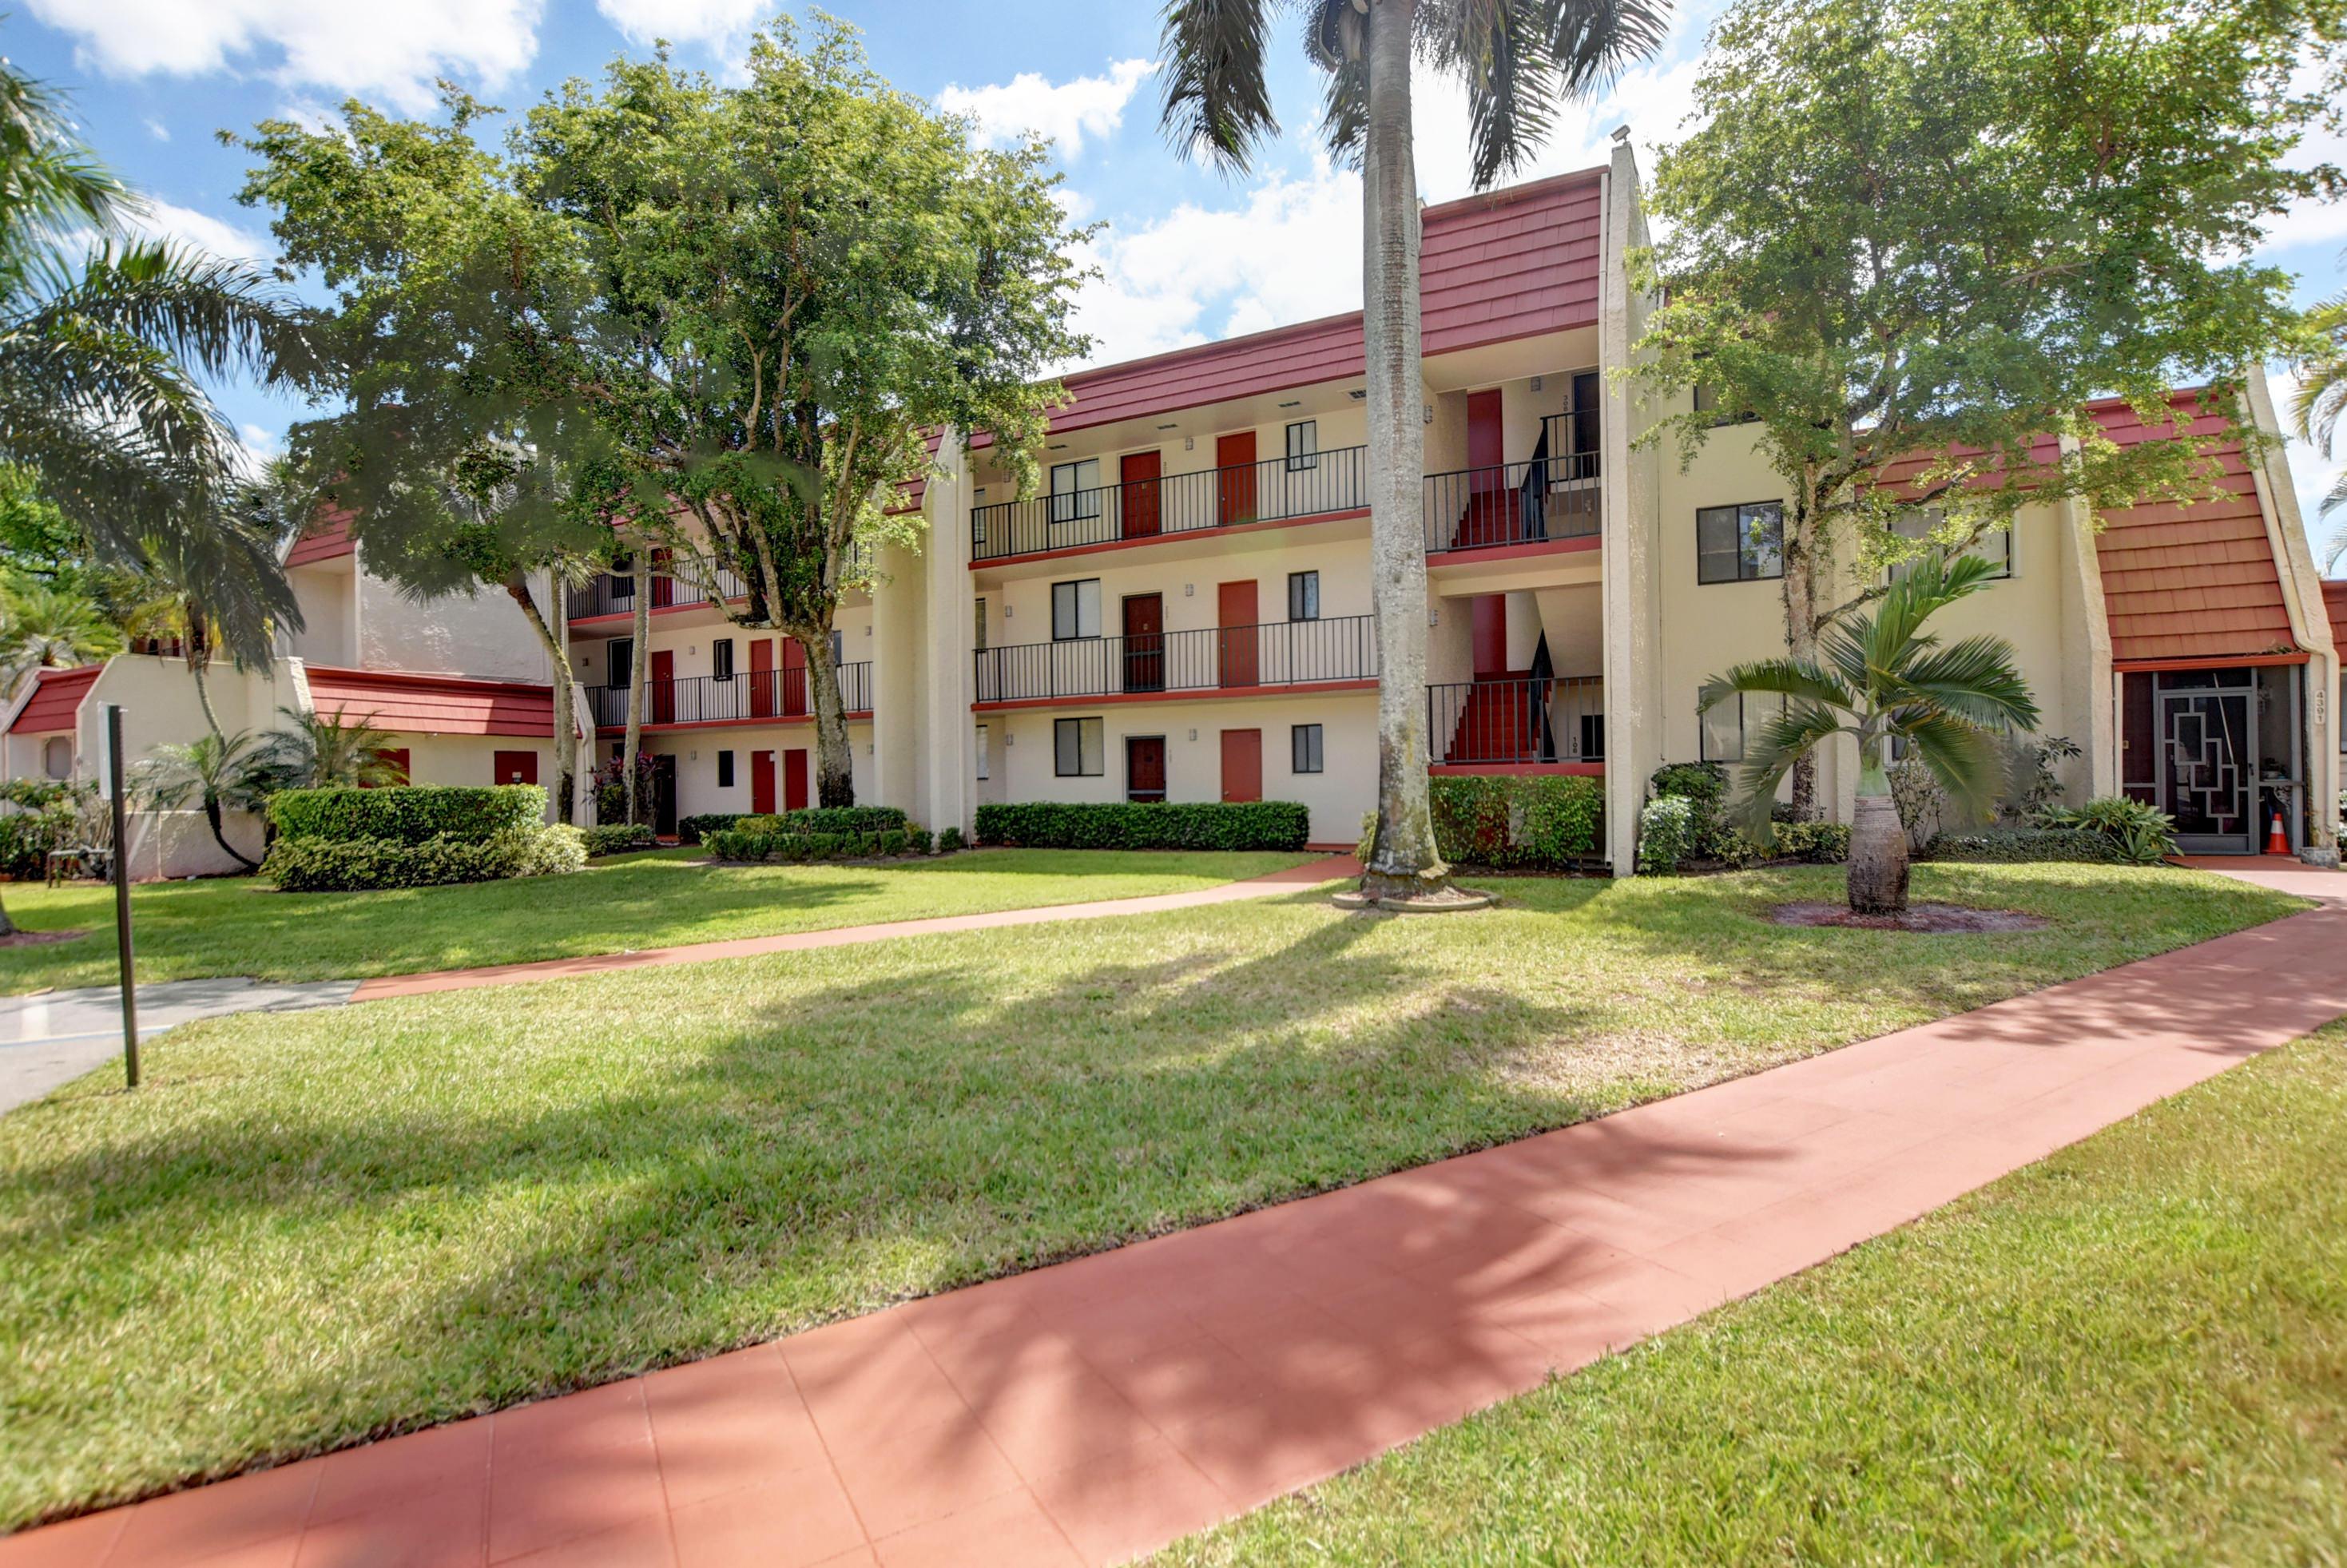 4393 Trevi Court 302 Lake Worth, FL 33467